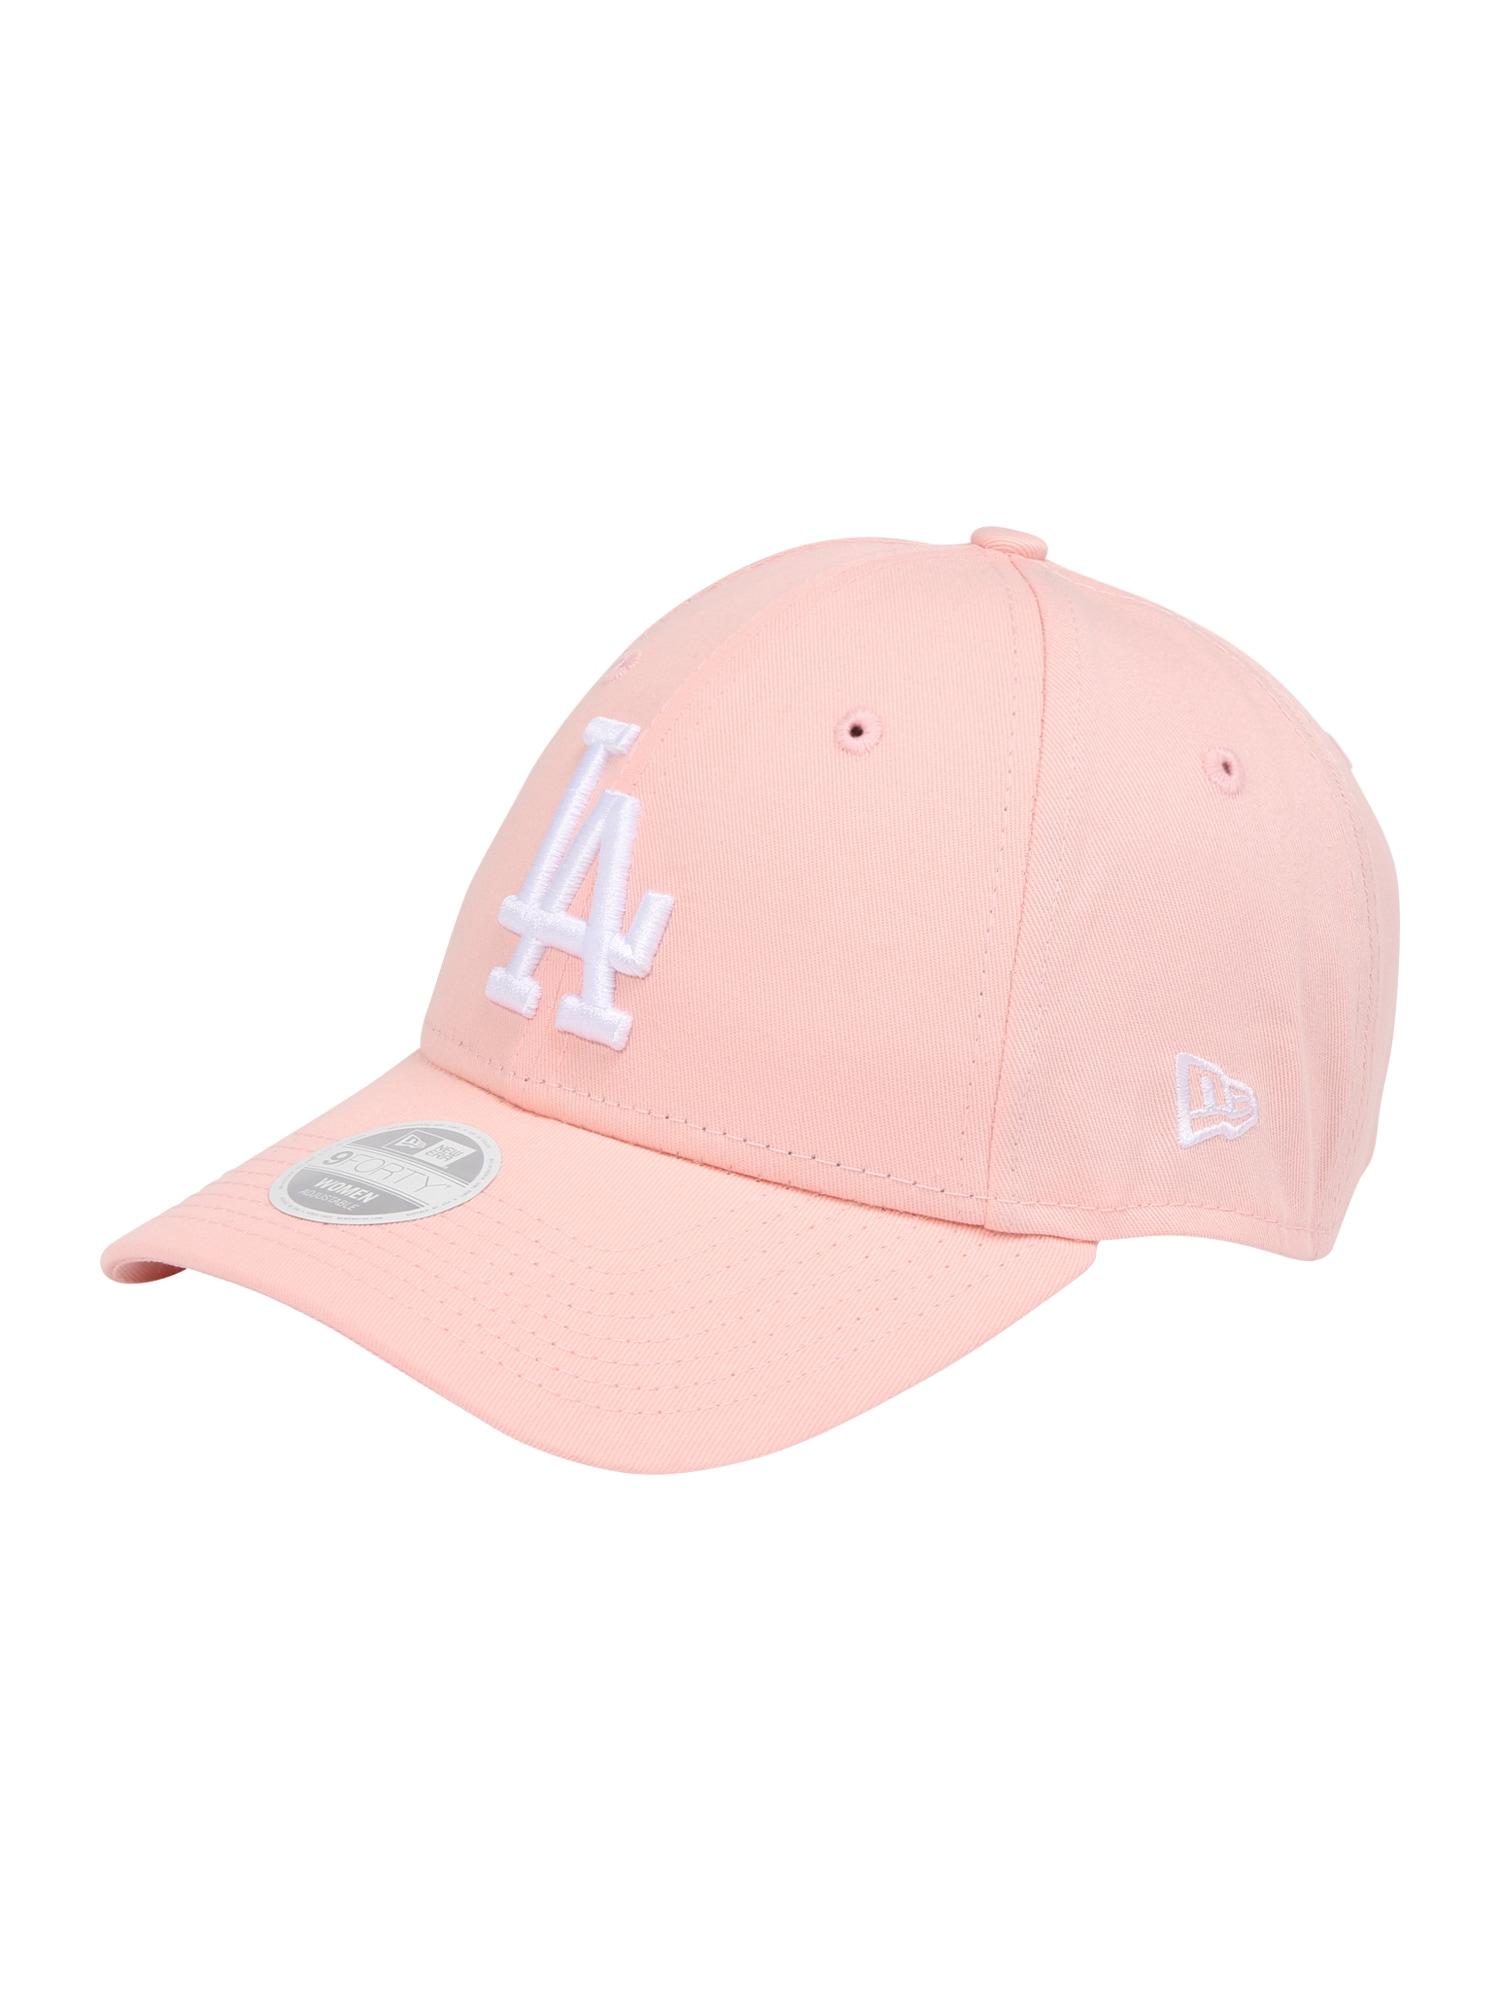 Čepice růžová bílá NEW ERA